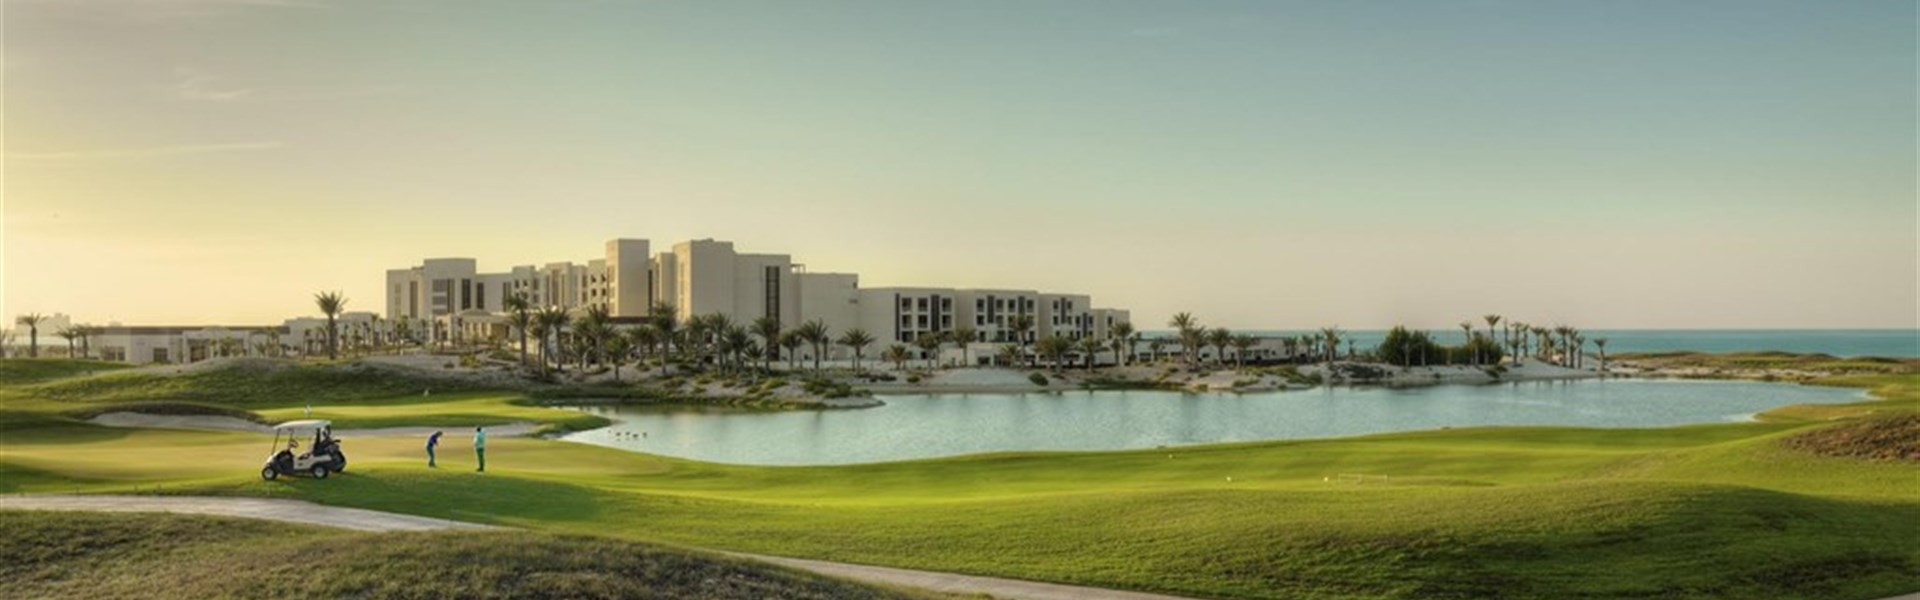 Luxusní golf v Abu Dhabi